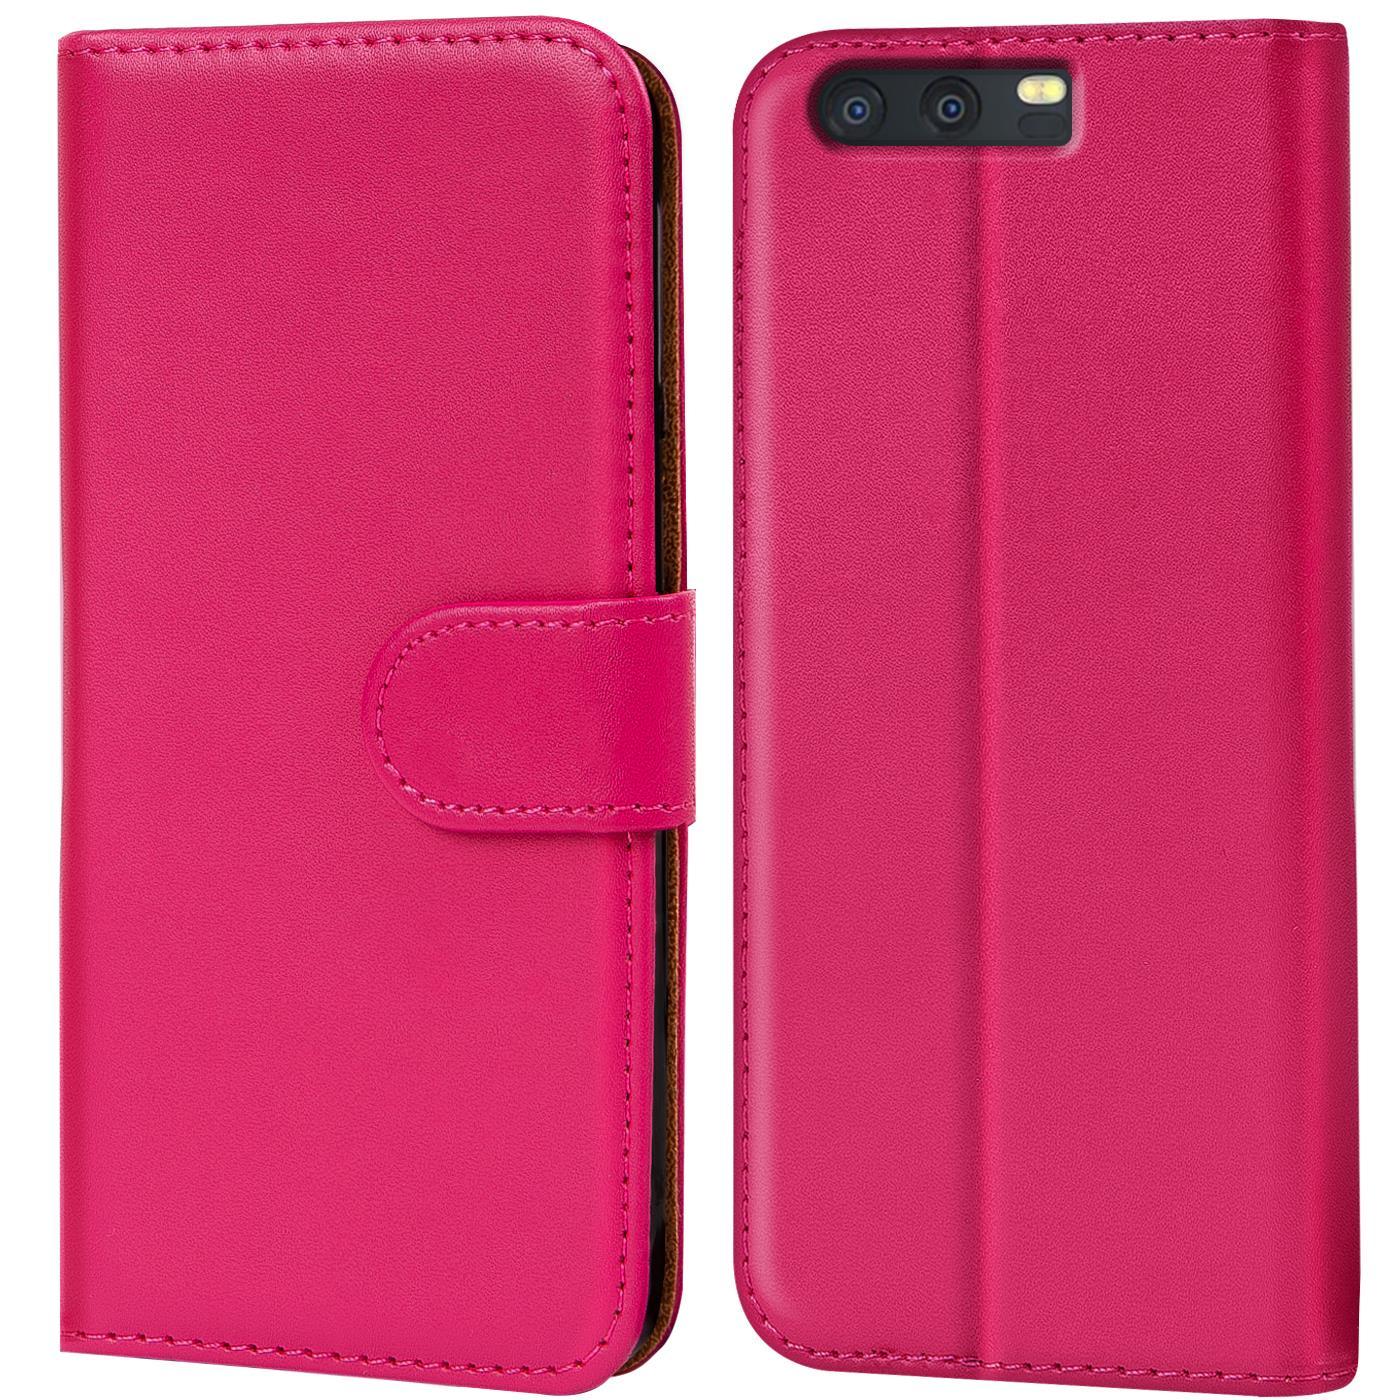 Case Schutz Hülle Etui für Huawei Honor Handy Tasche Full Flip Cover Bumper Book